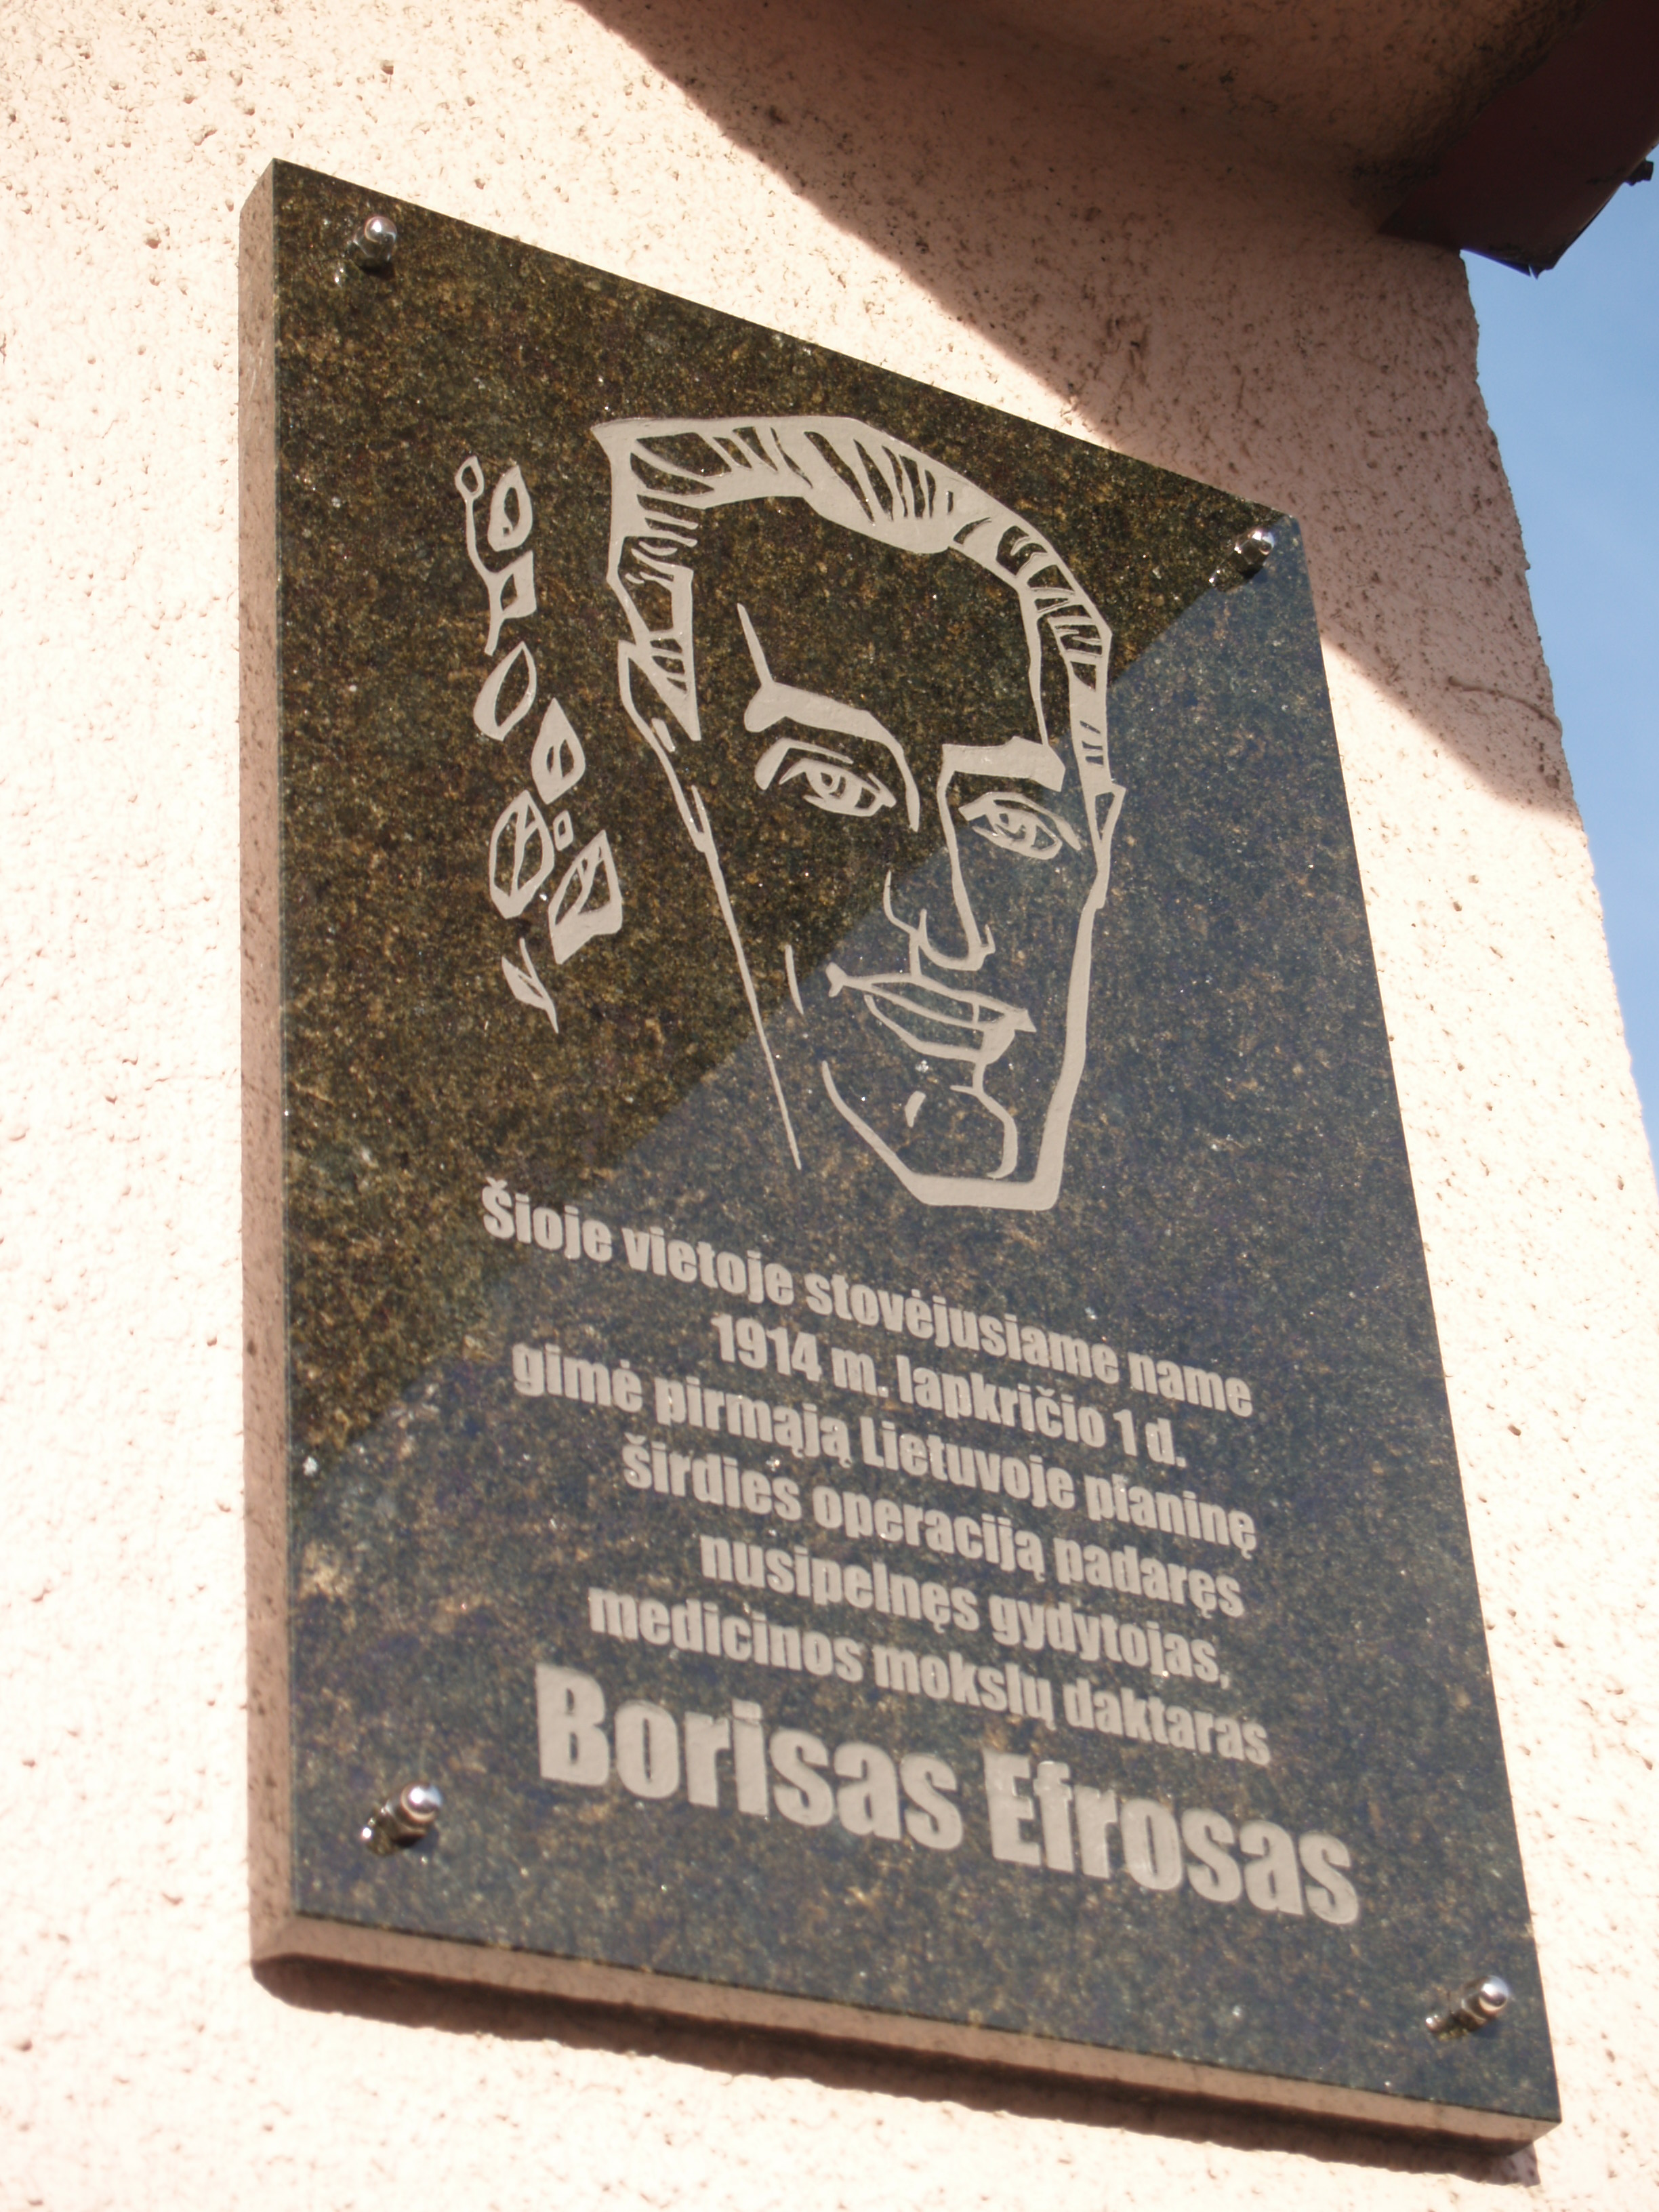 Memorialinė lenta dr. Boriso Efroso atminimui